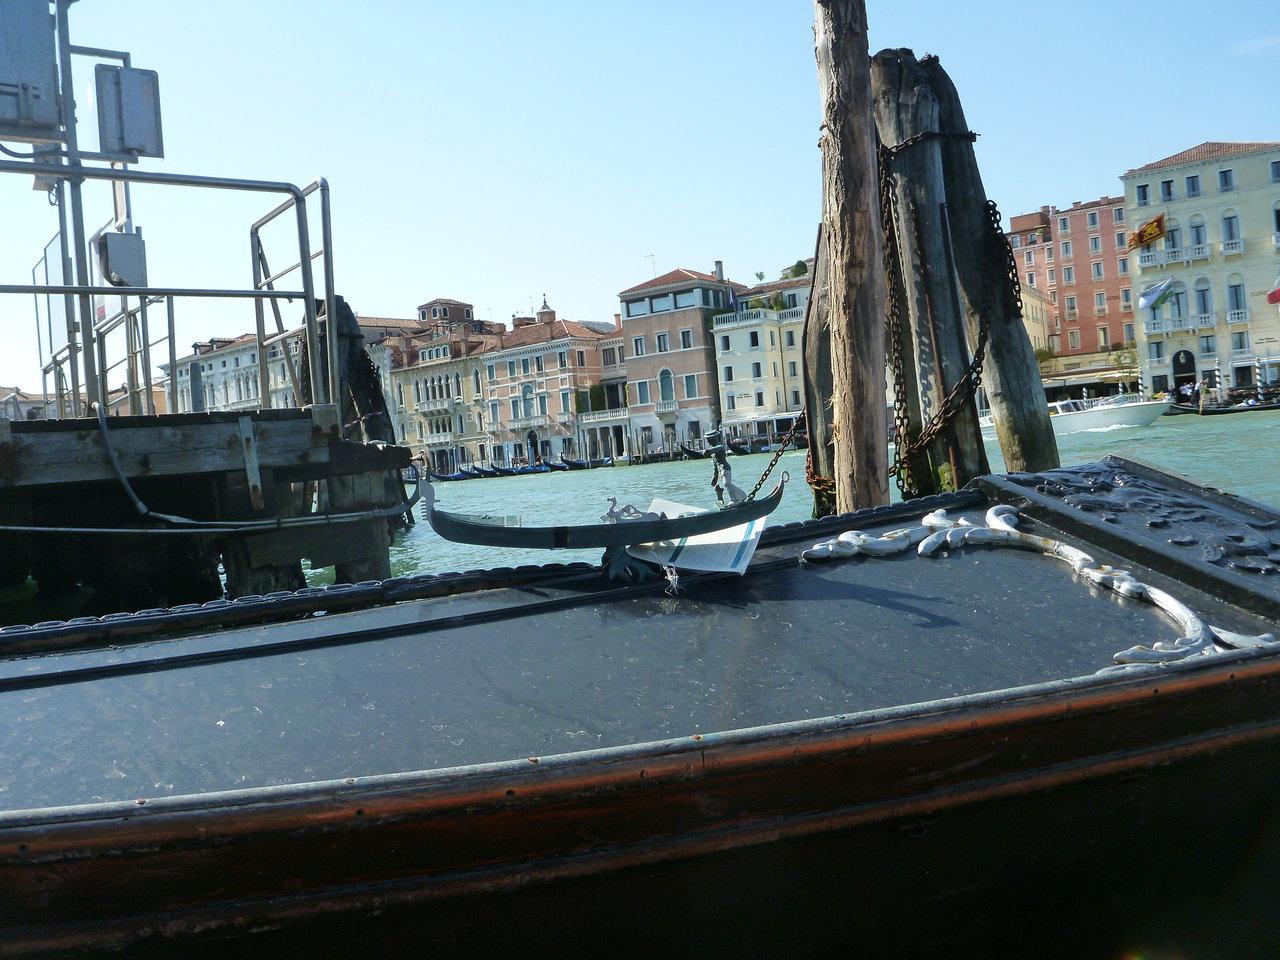 Gondola on gondola